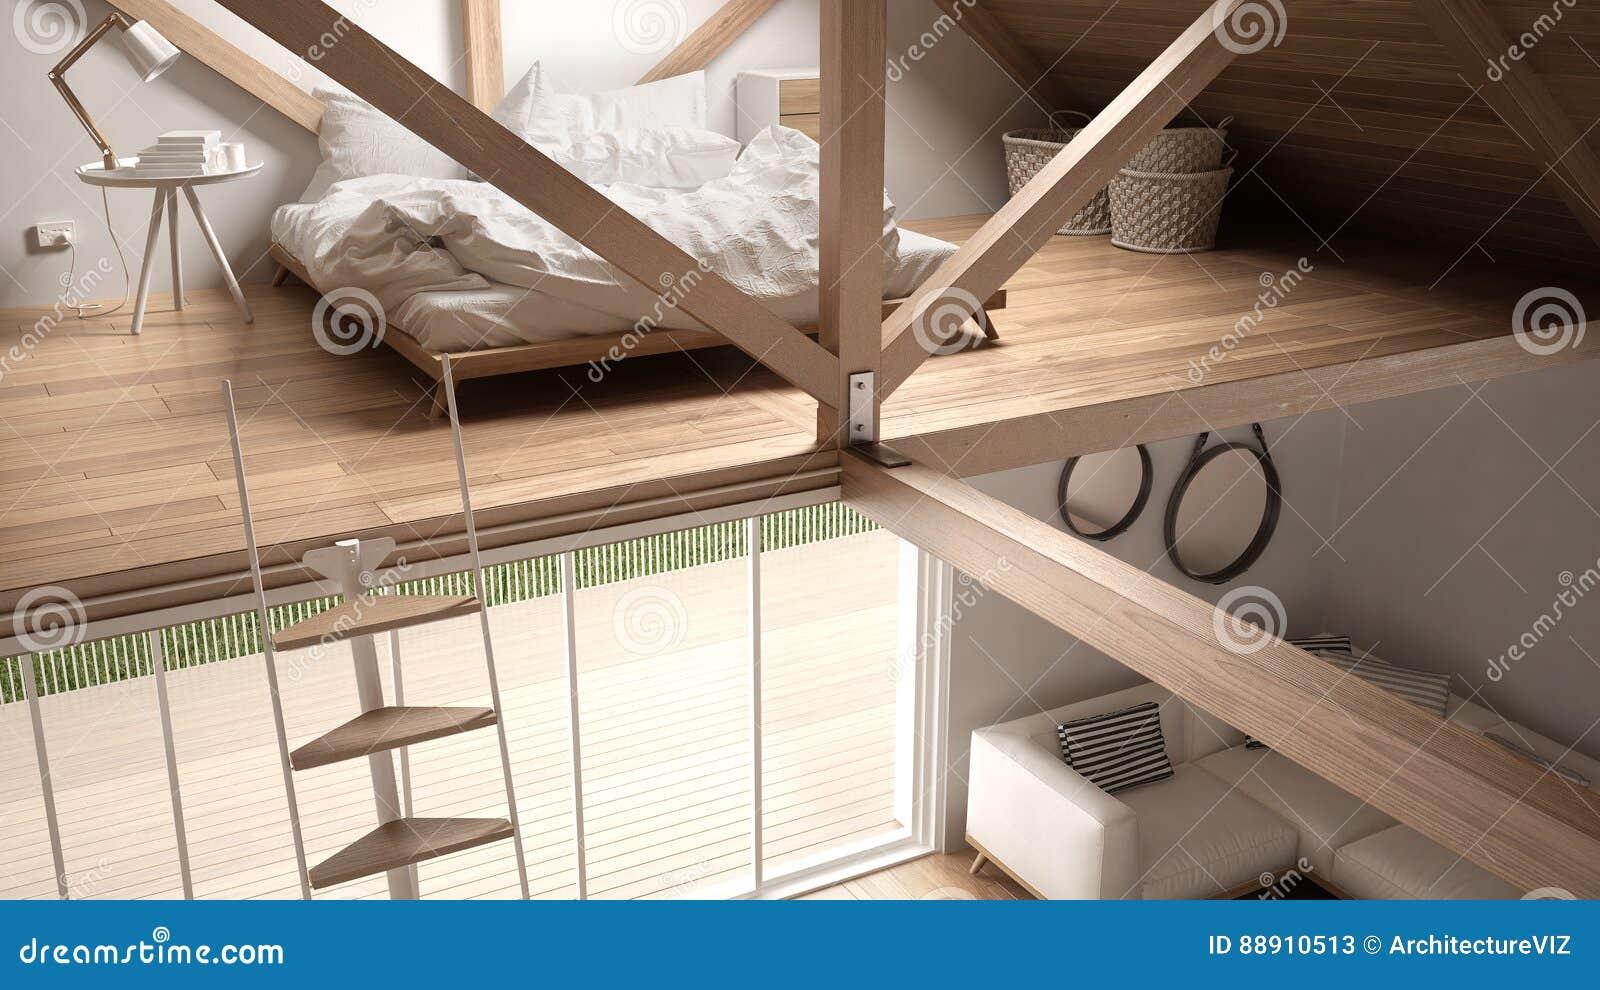 Mezzanine Loft Bedroom Stairs And Living With Sofa Minimalist